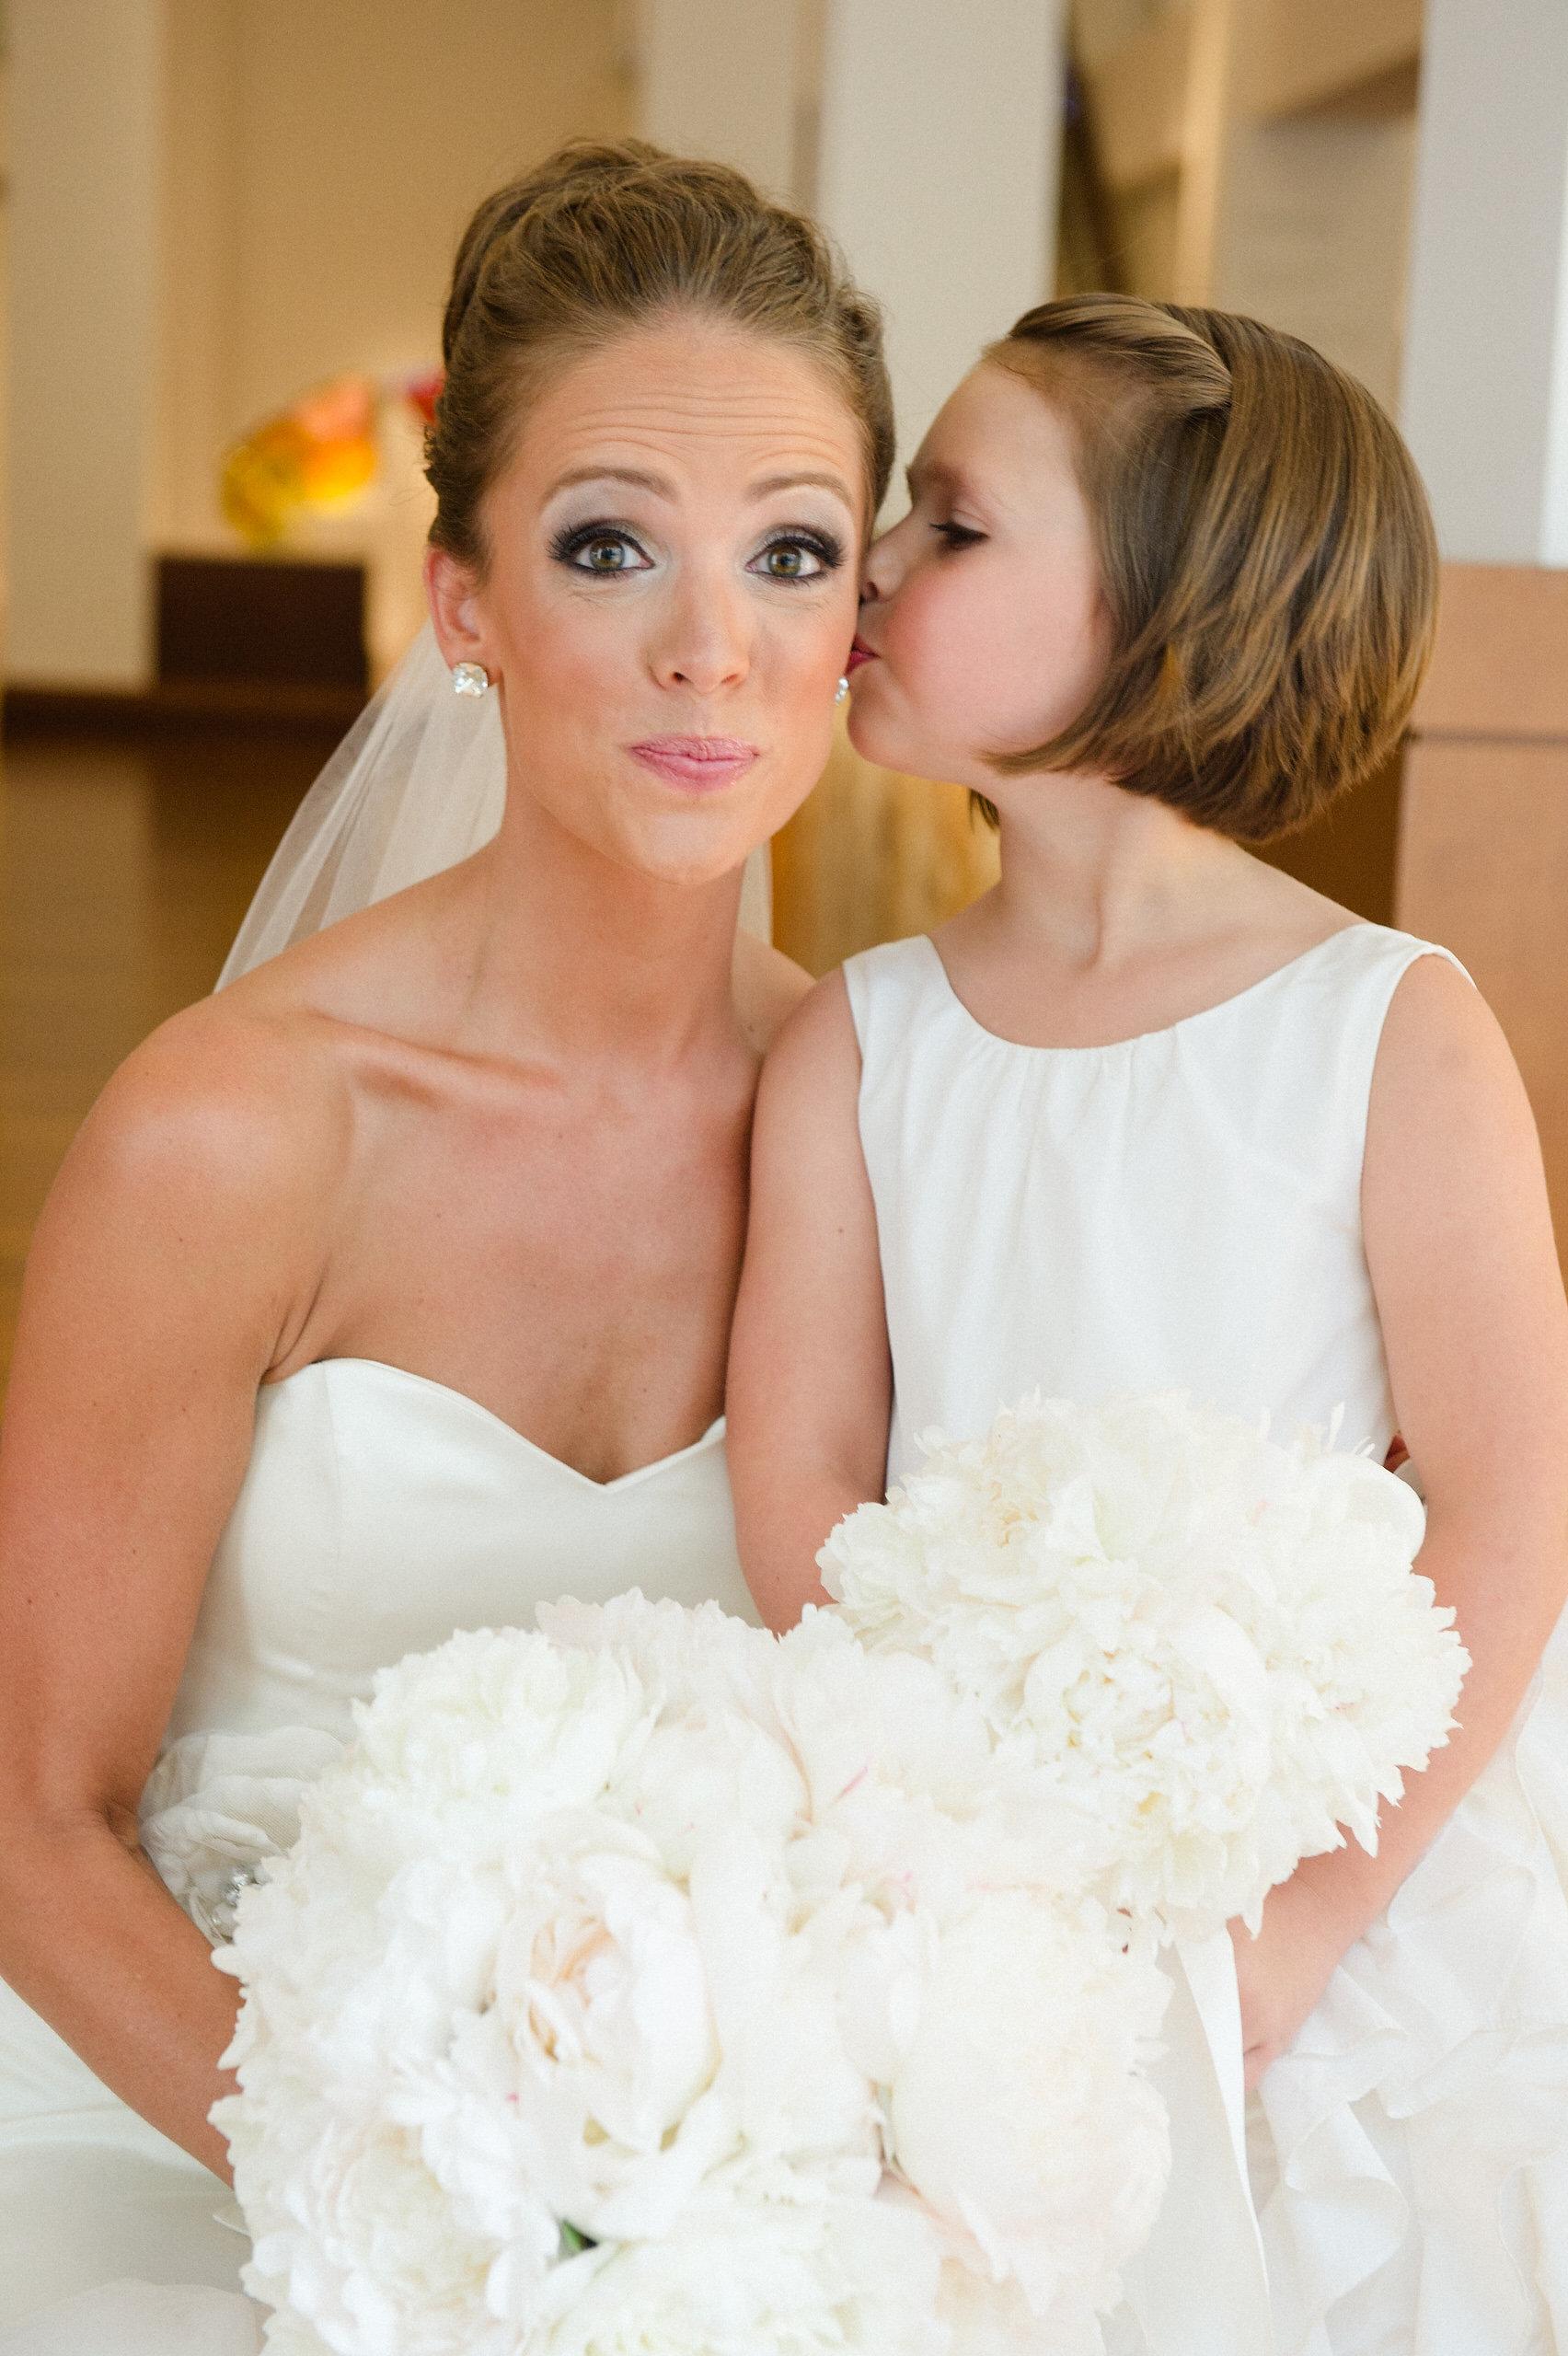 shelby&jordan|smitten&hooked|wedding|groups-107.jpg